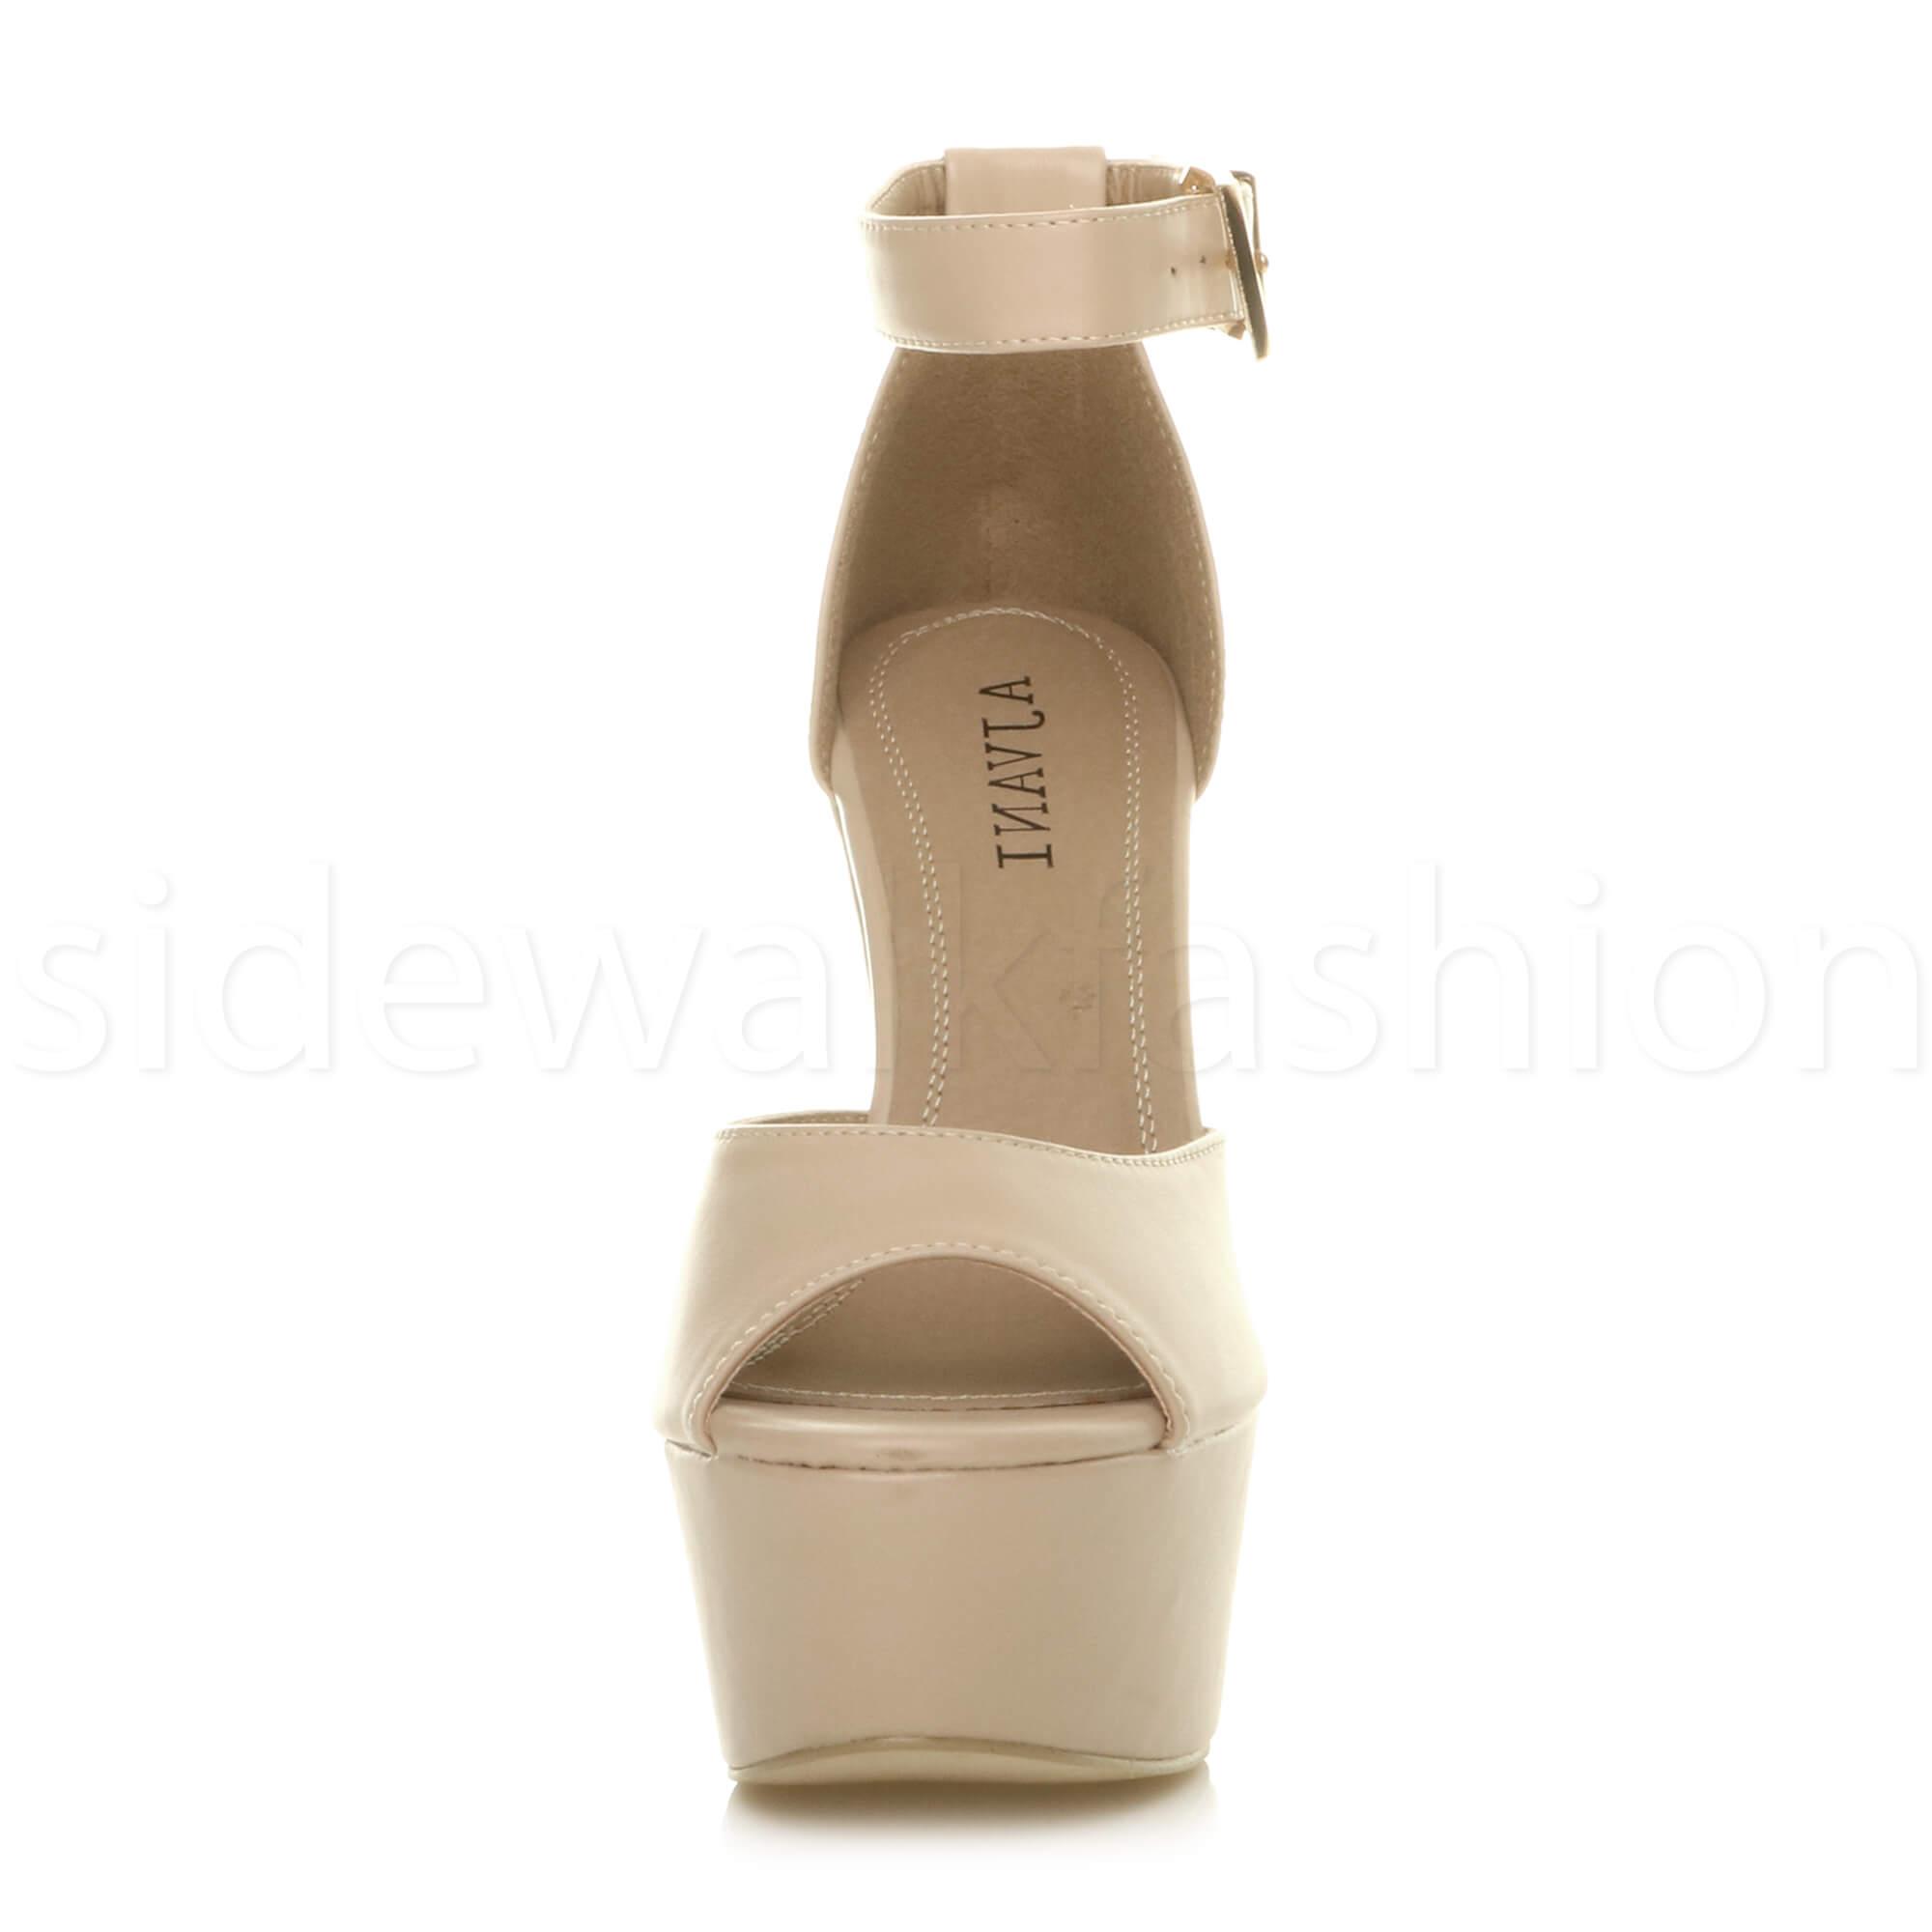 Womens-ladies-high-block-heel-peep-toe-shoes-evening-party-platform-sandals-size thumbnail 21